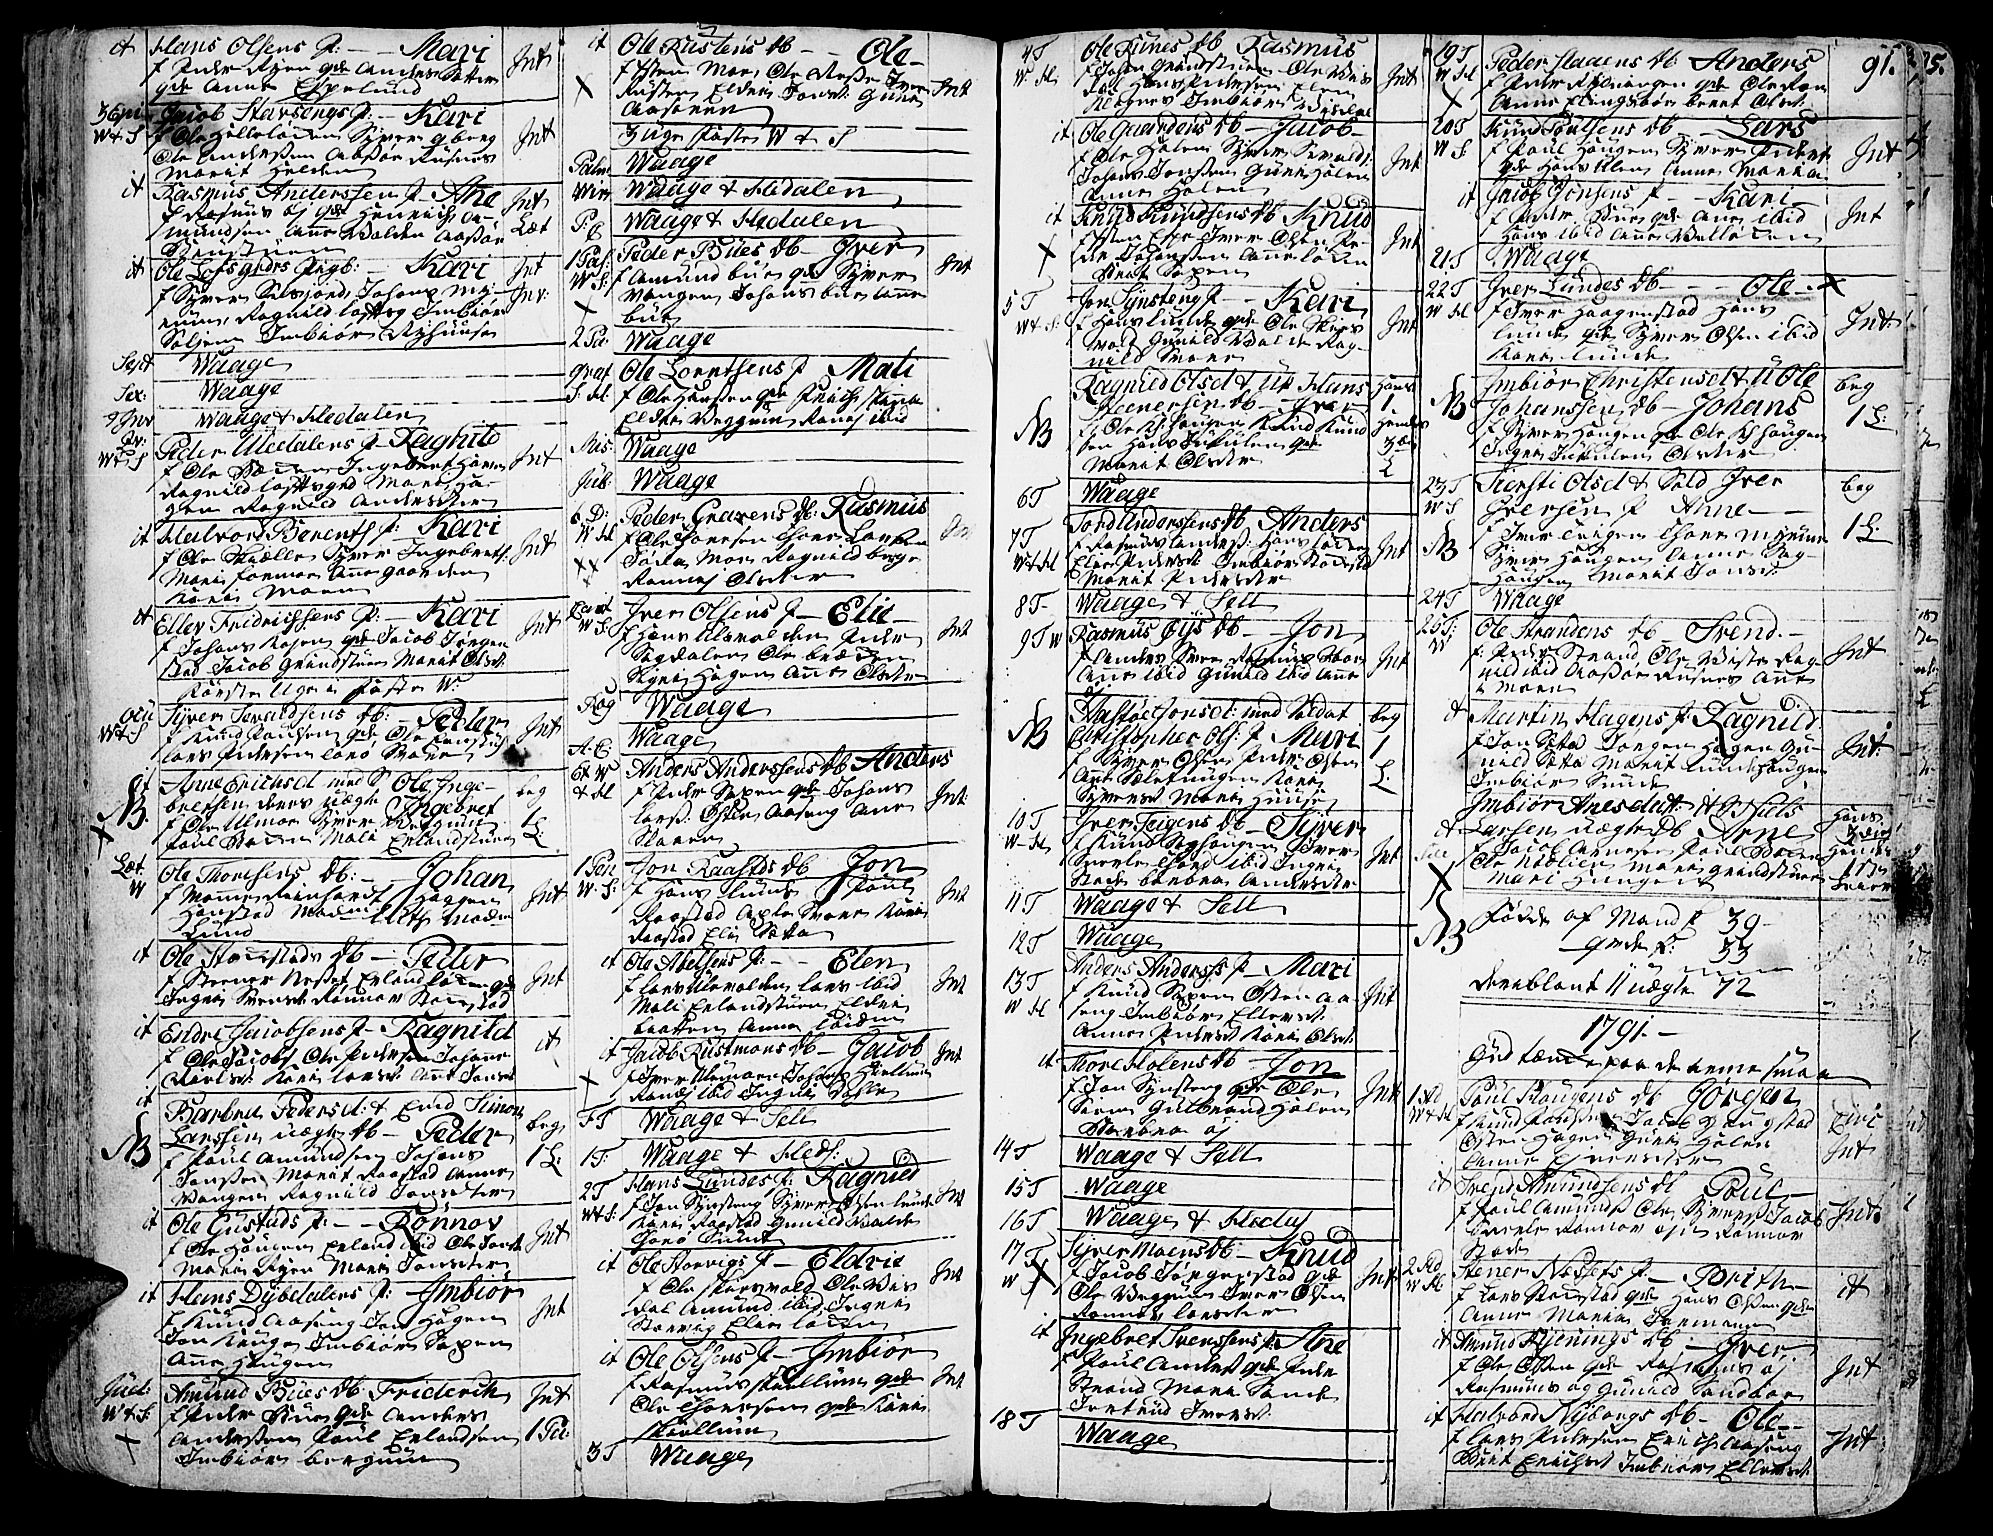 SAH, Vågå prestekontor, Ministerialbok nr. 1, 1739-1810, s. 91